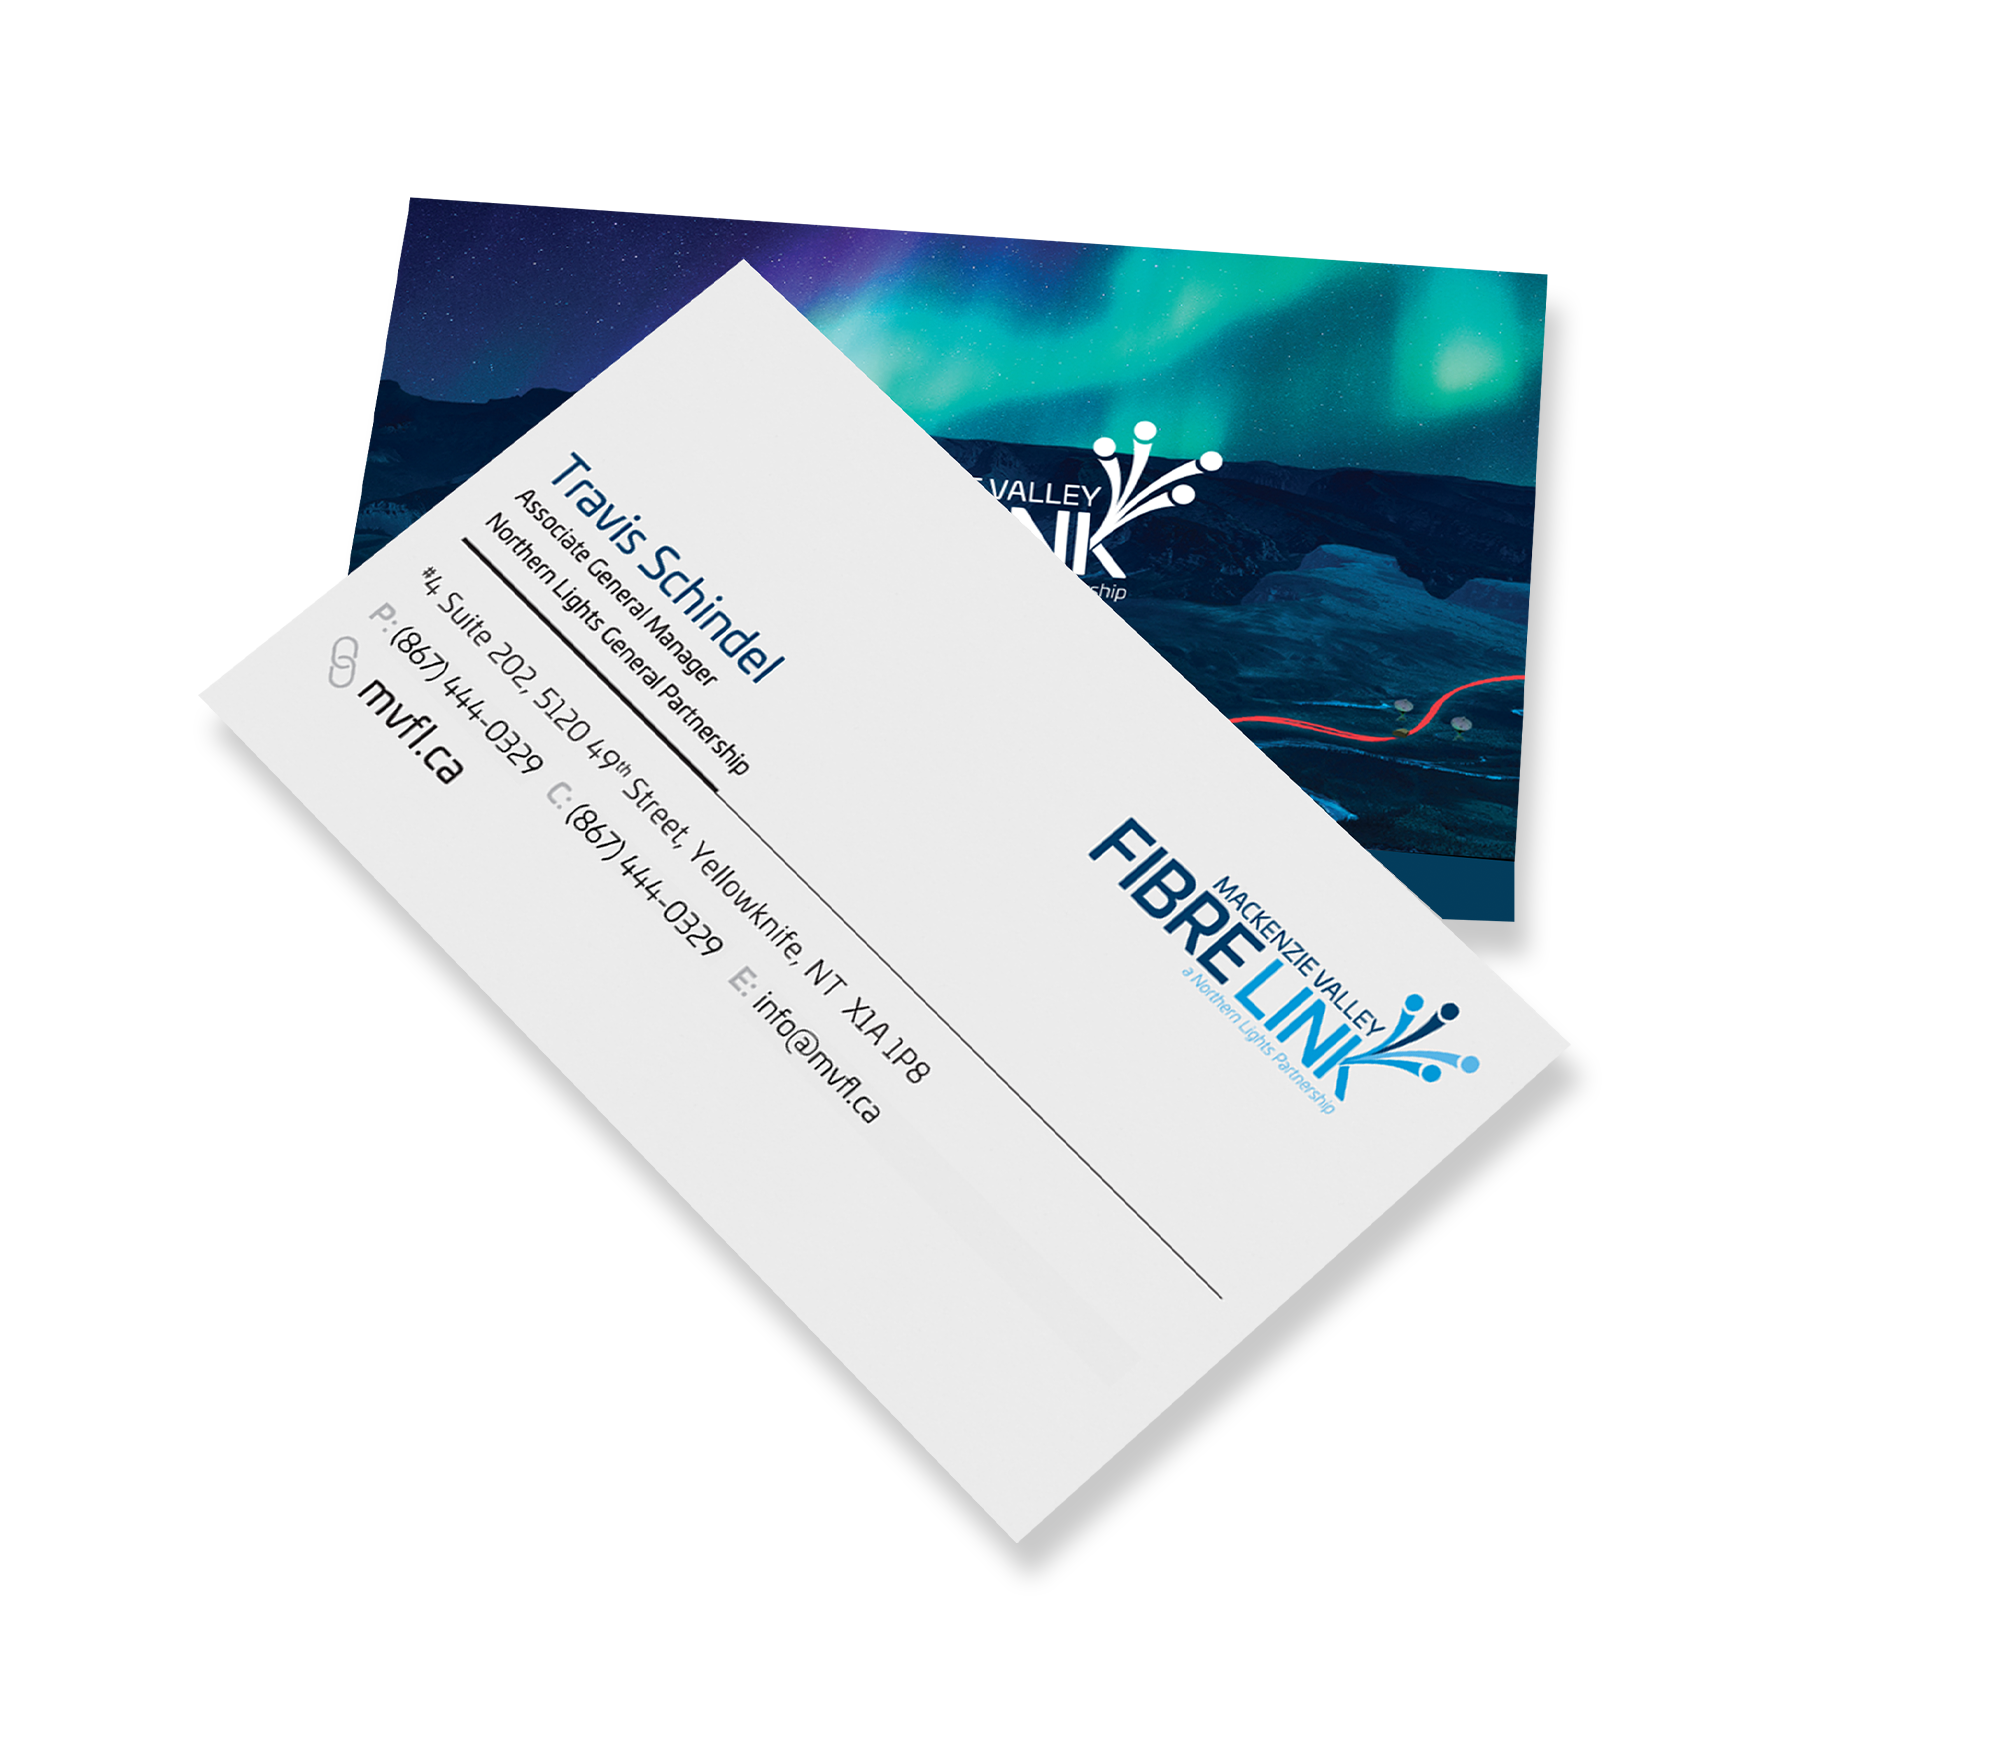 Sample image of business card design for Mackenzie Valley Fibre Link.